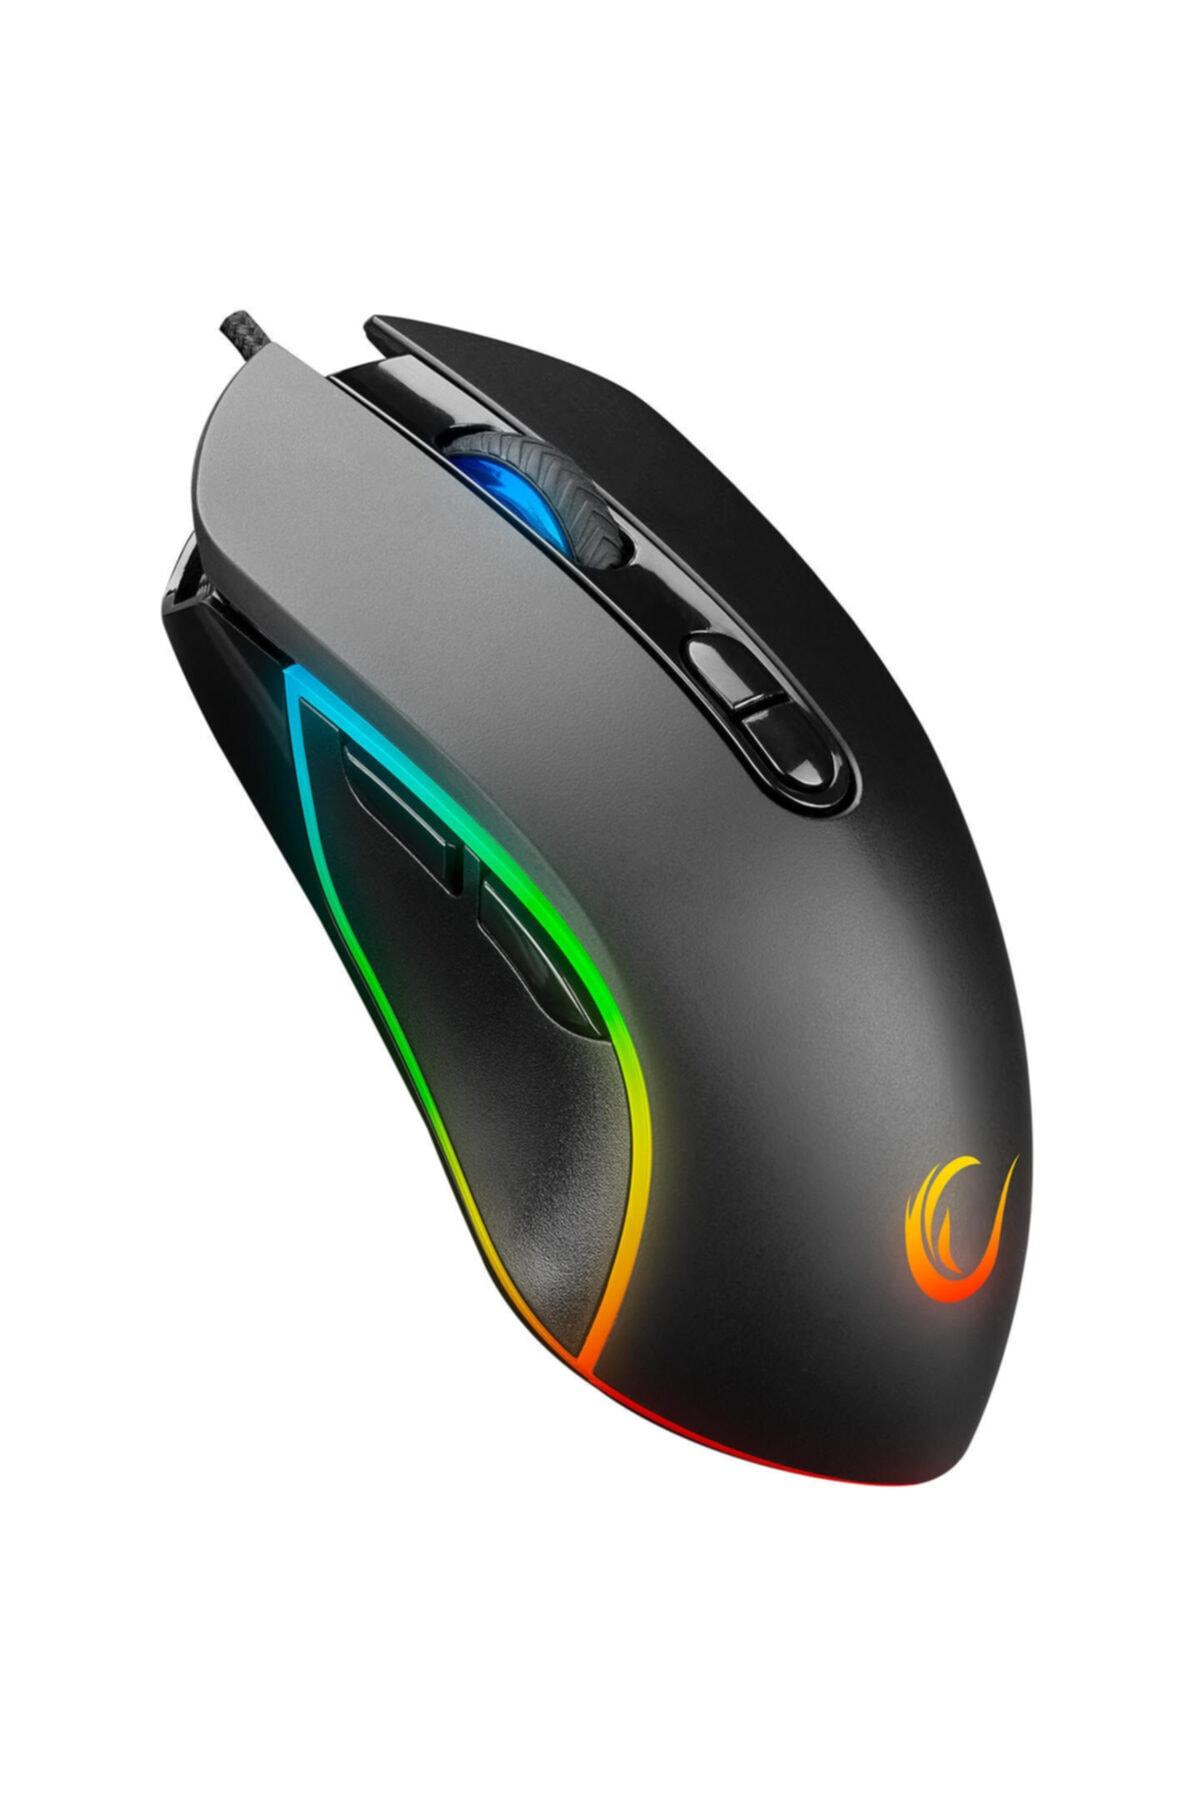 Smx-g65 Alpor Makro Tuşlu 7200dpi Rgb Ledli Drag Click Gaming Oyuncu Mouse